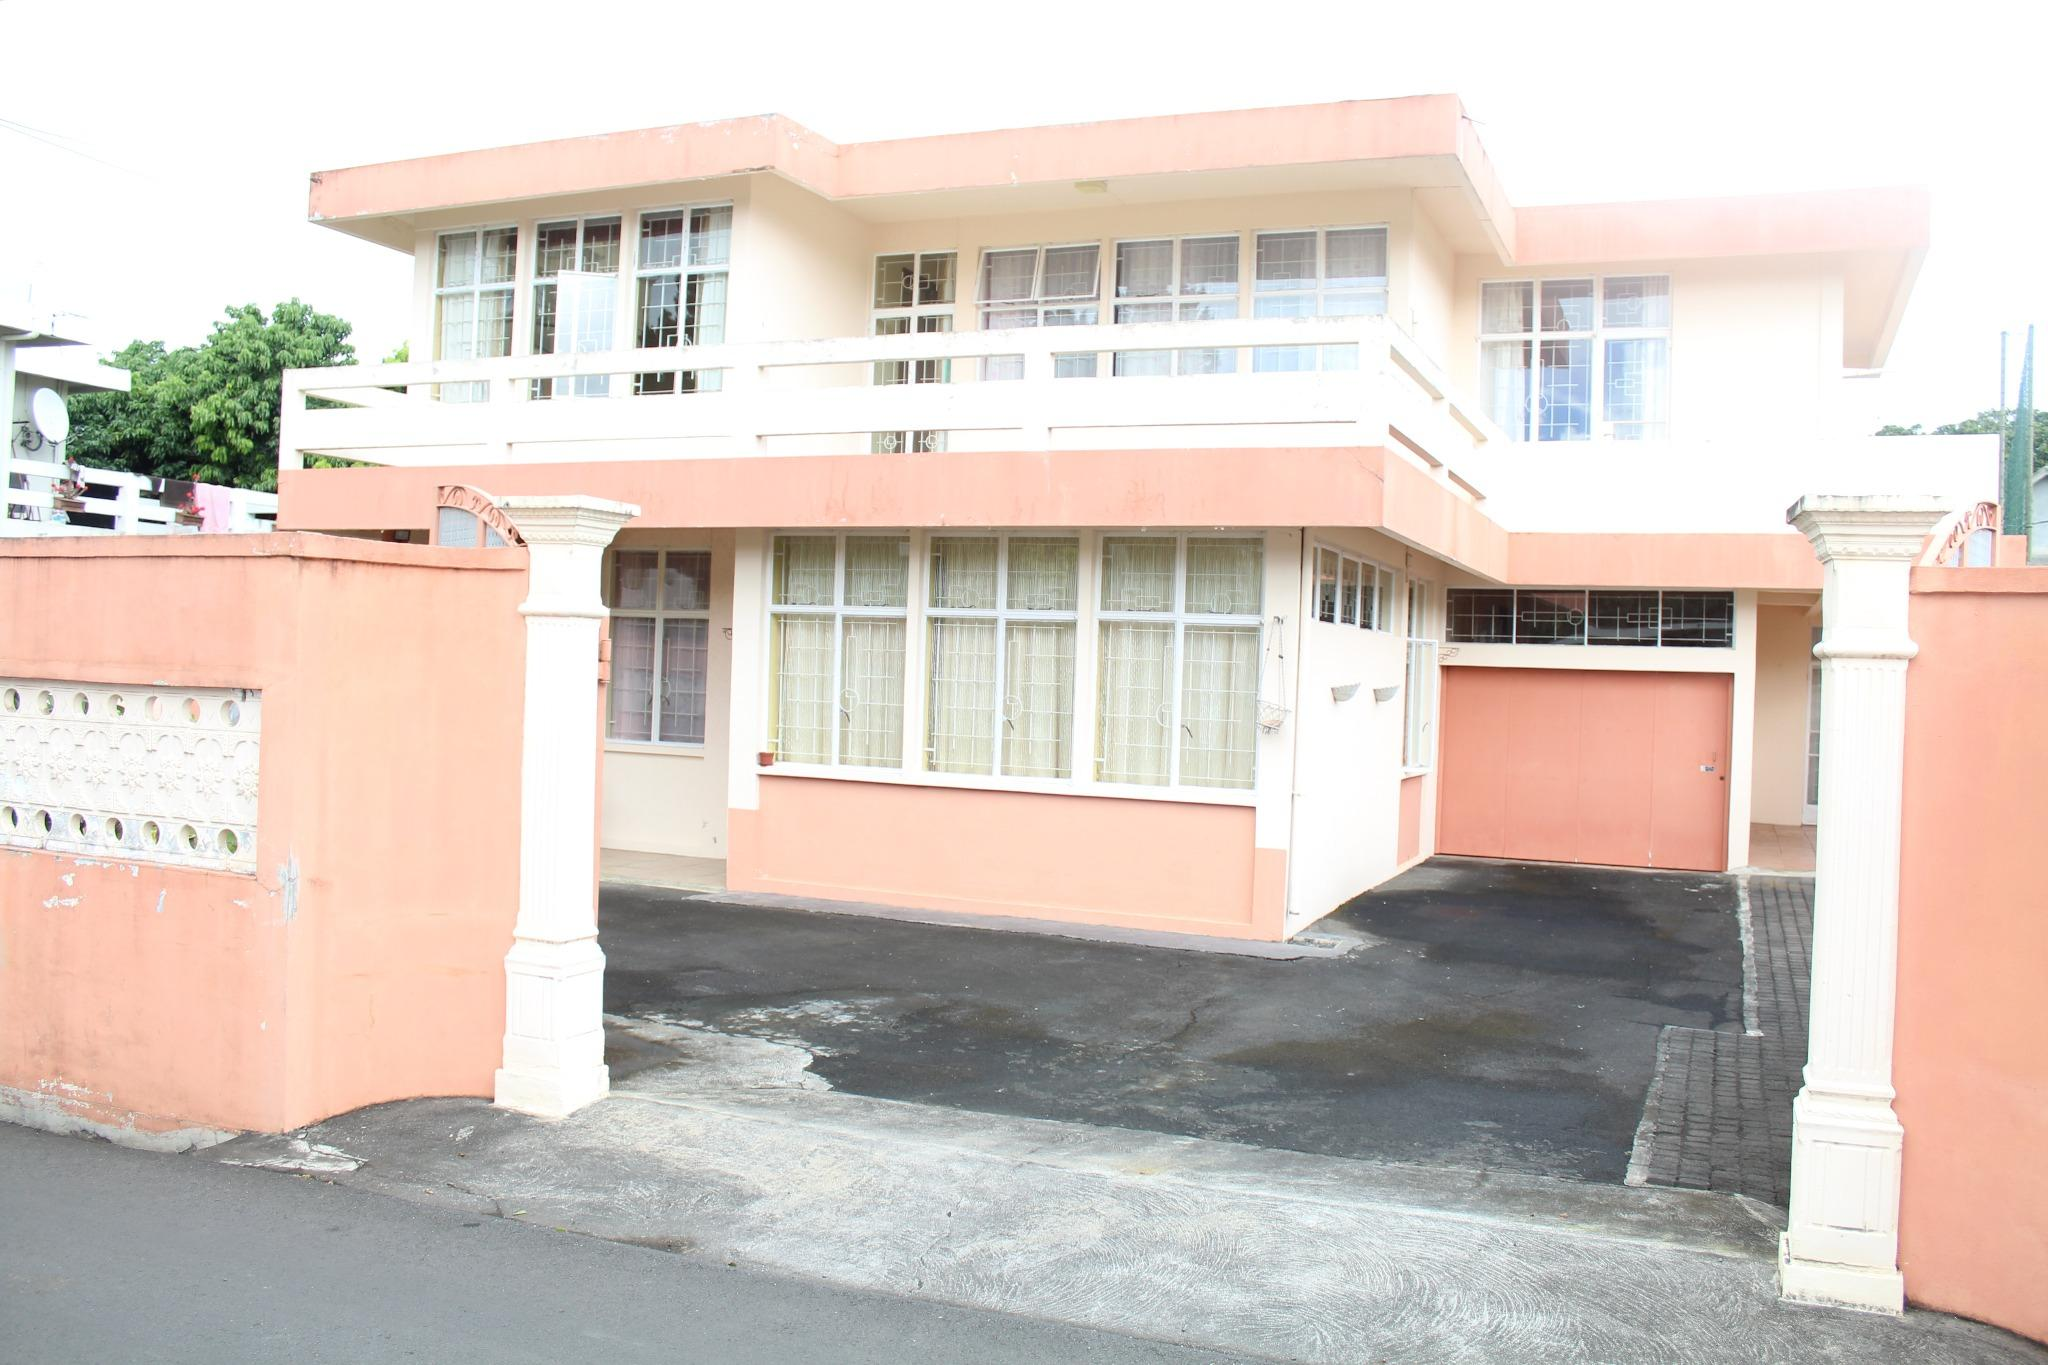 FOR SALE – House of 325 m2 in Vieux Quatre Bornes